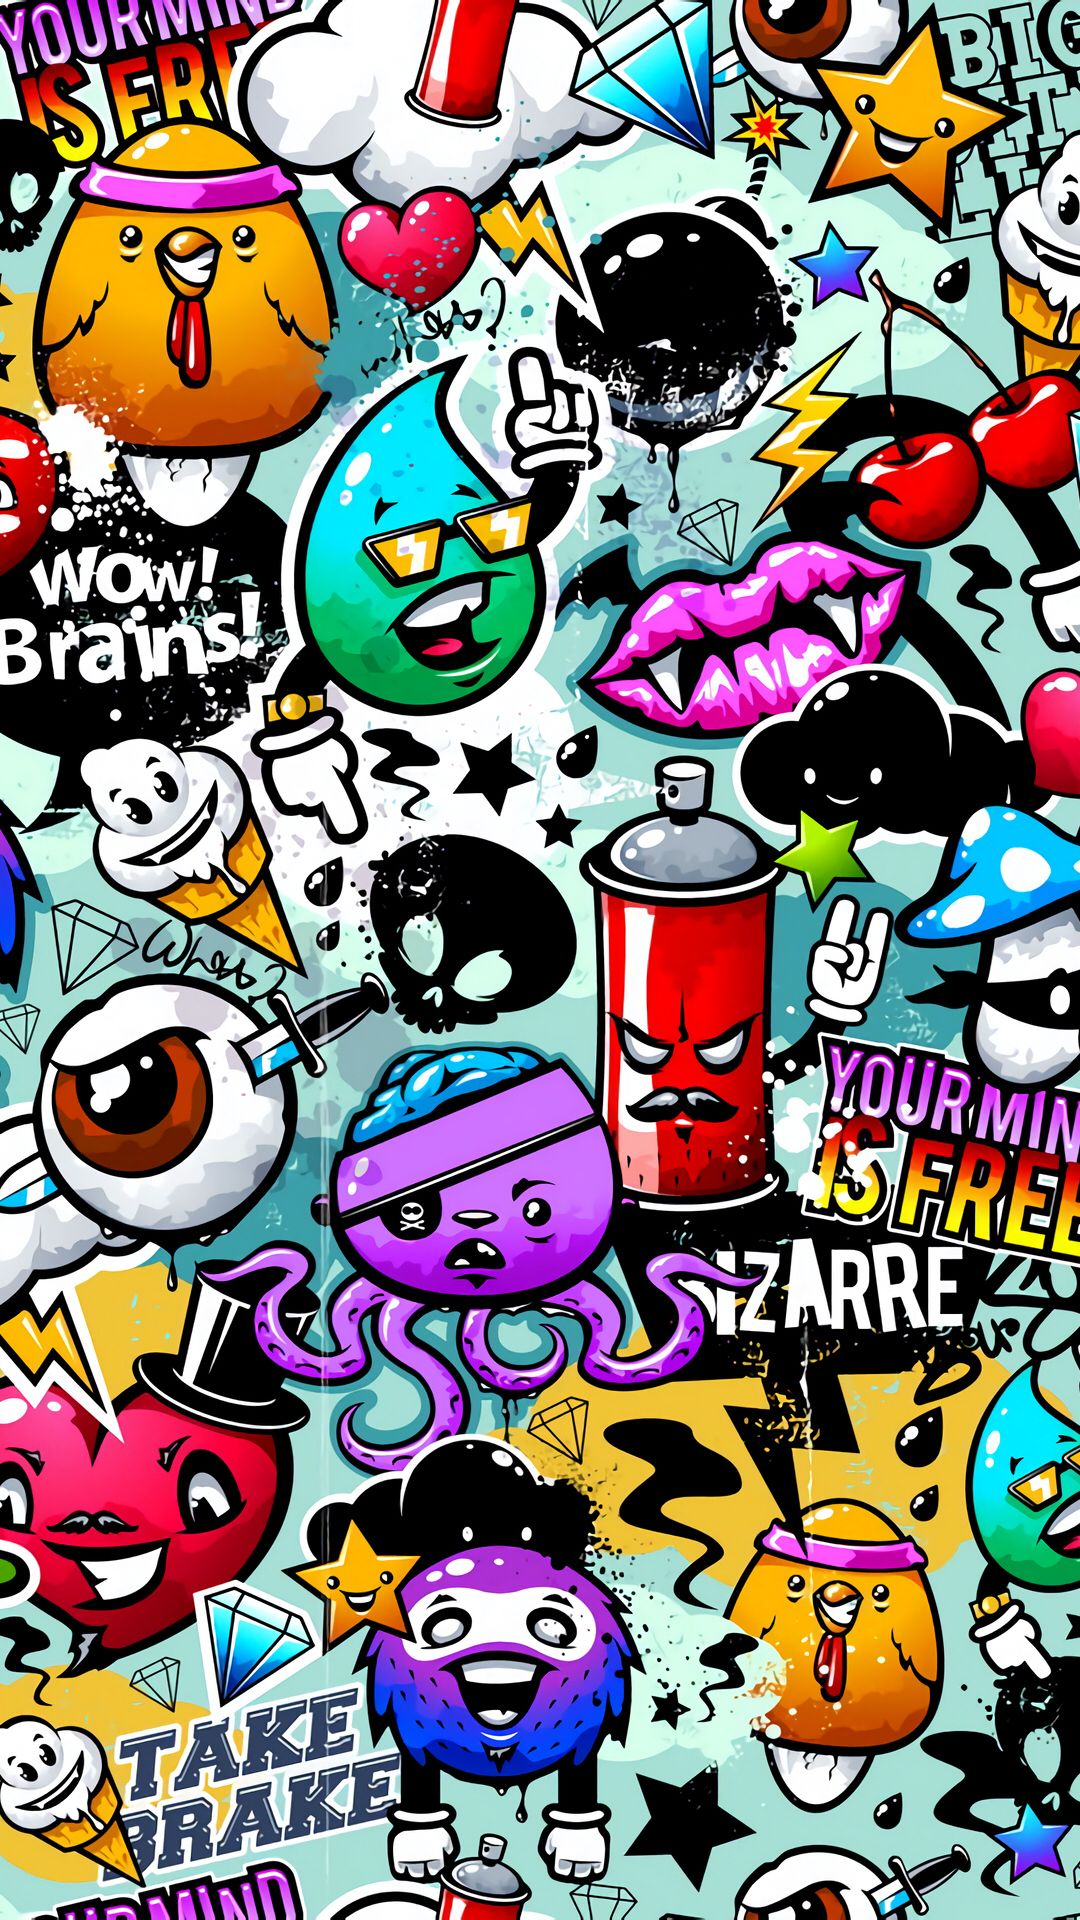 vector image by Adam danish Graffiti wallpaper iphone